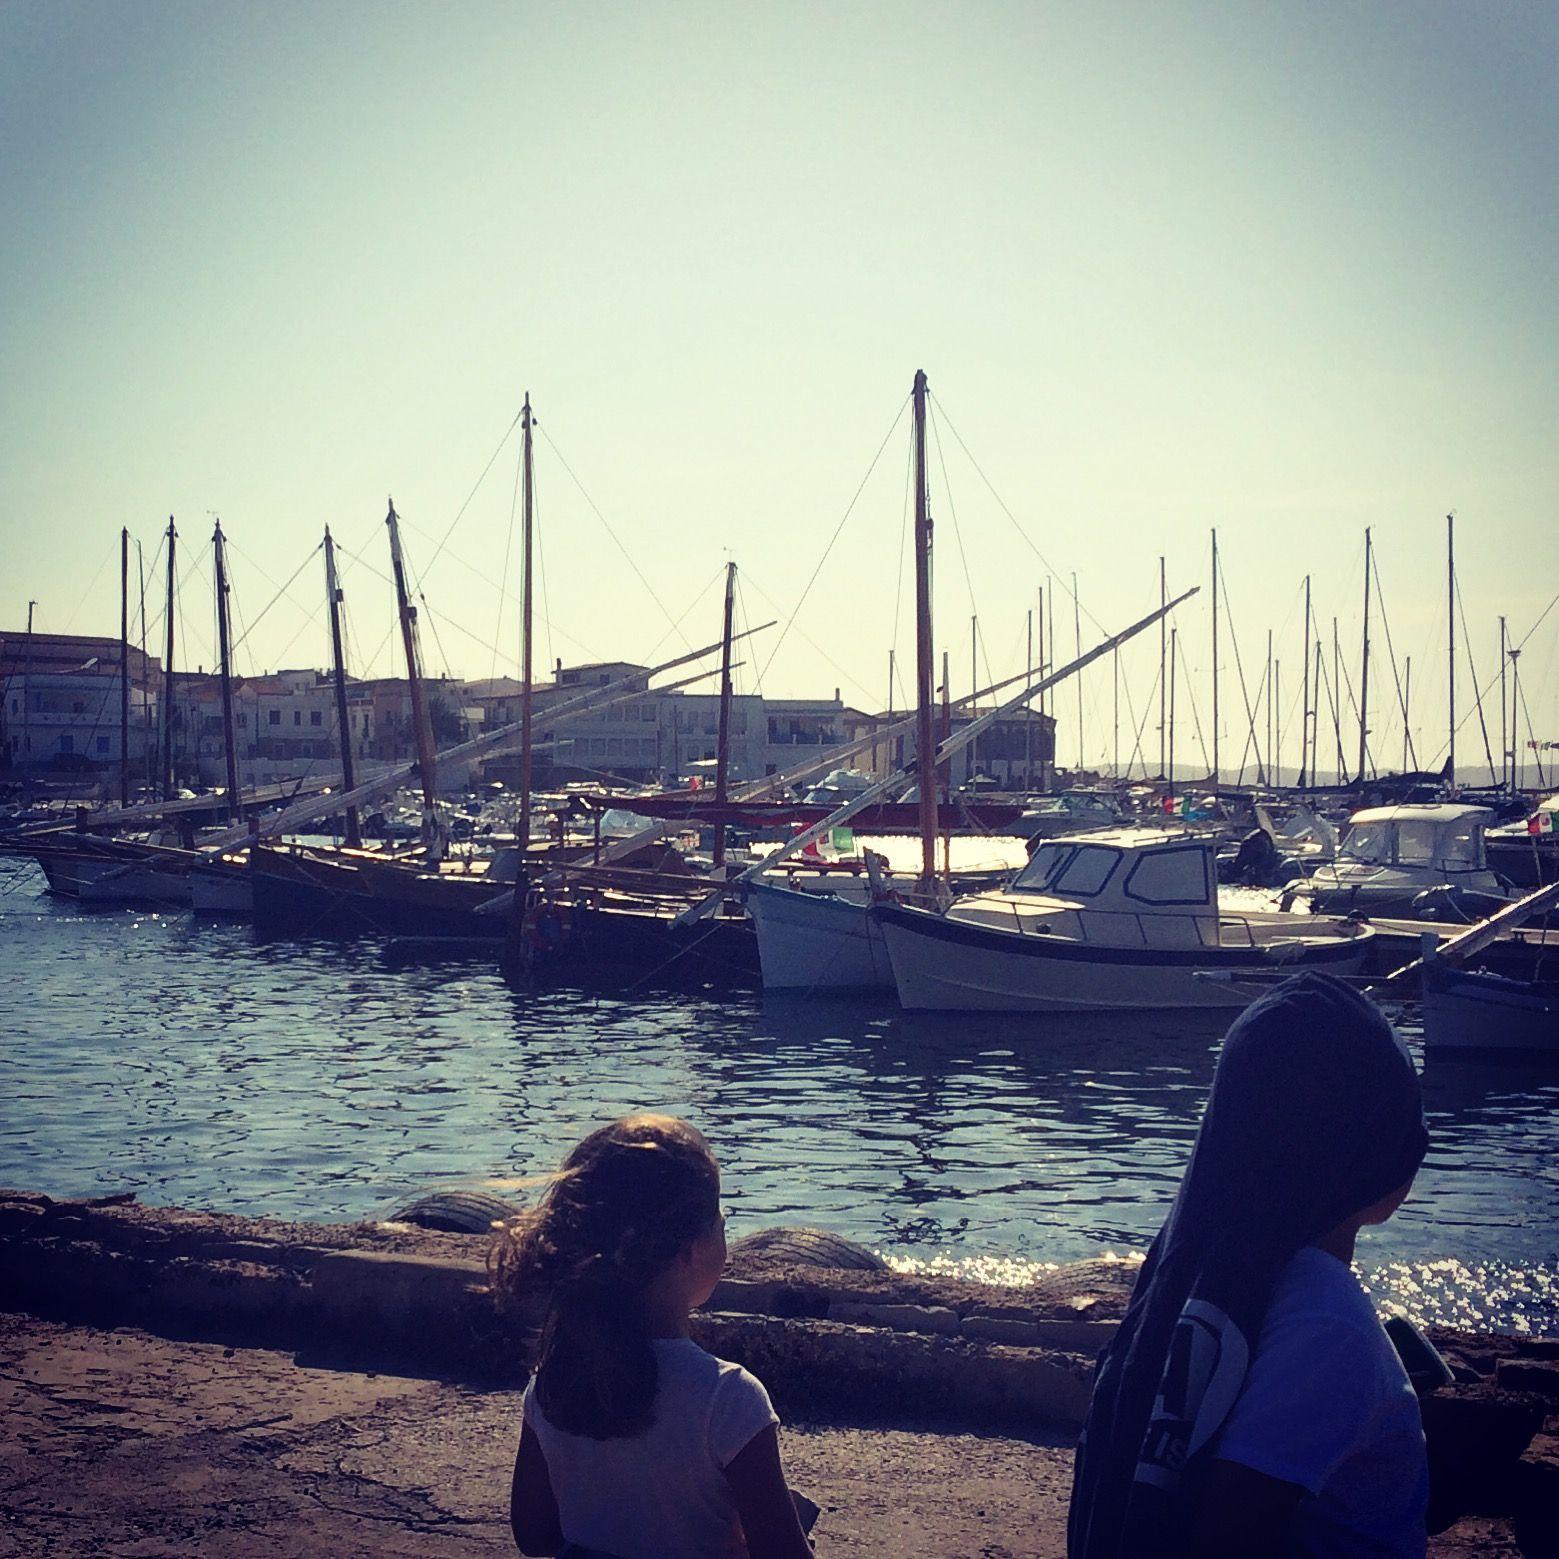 Calasetta, Sardegna, il pontile delle Vele Latine